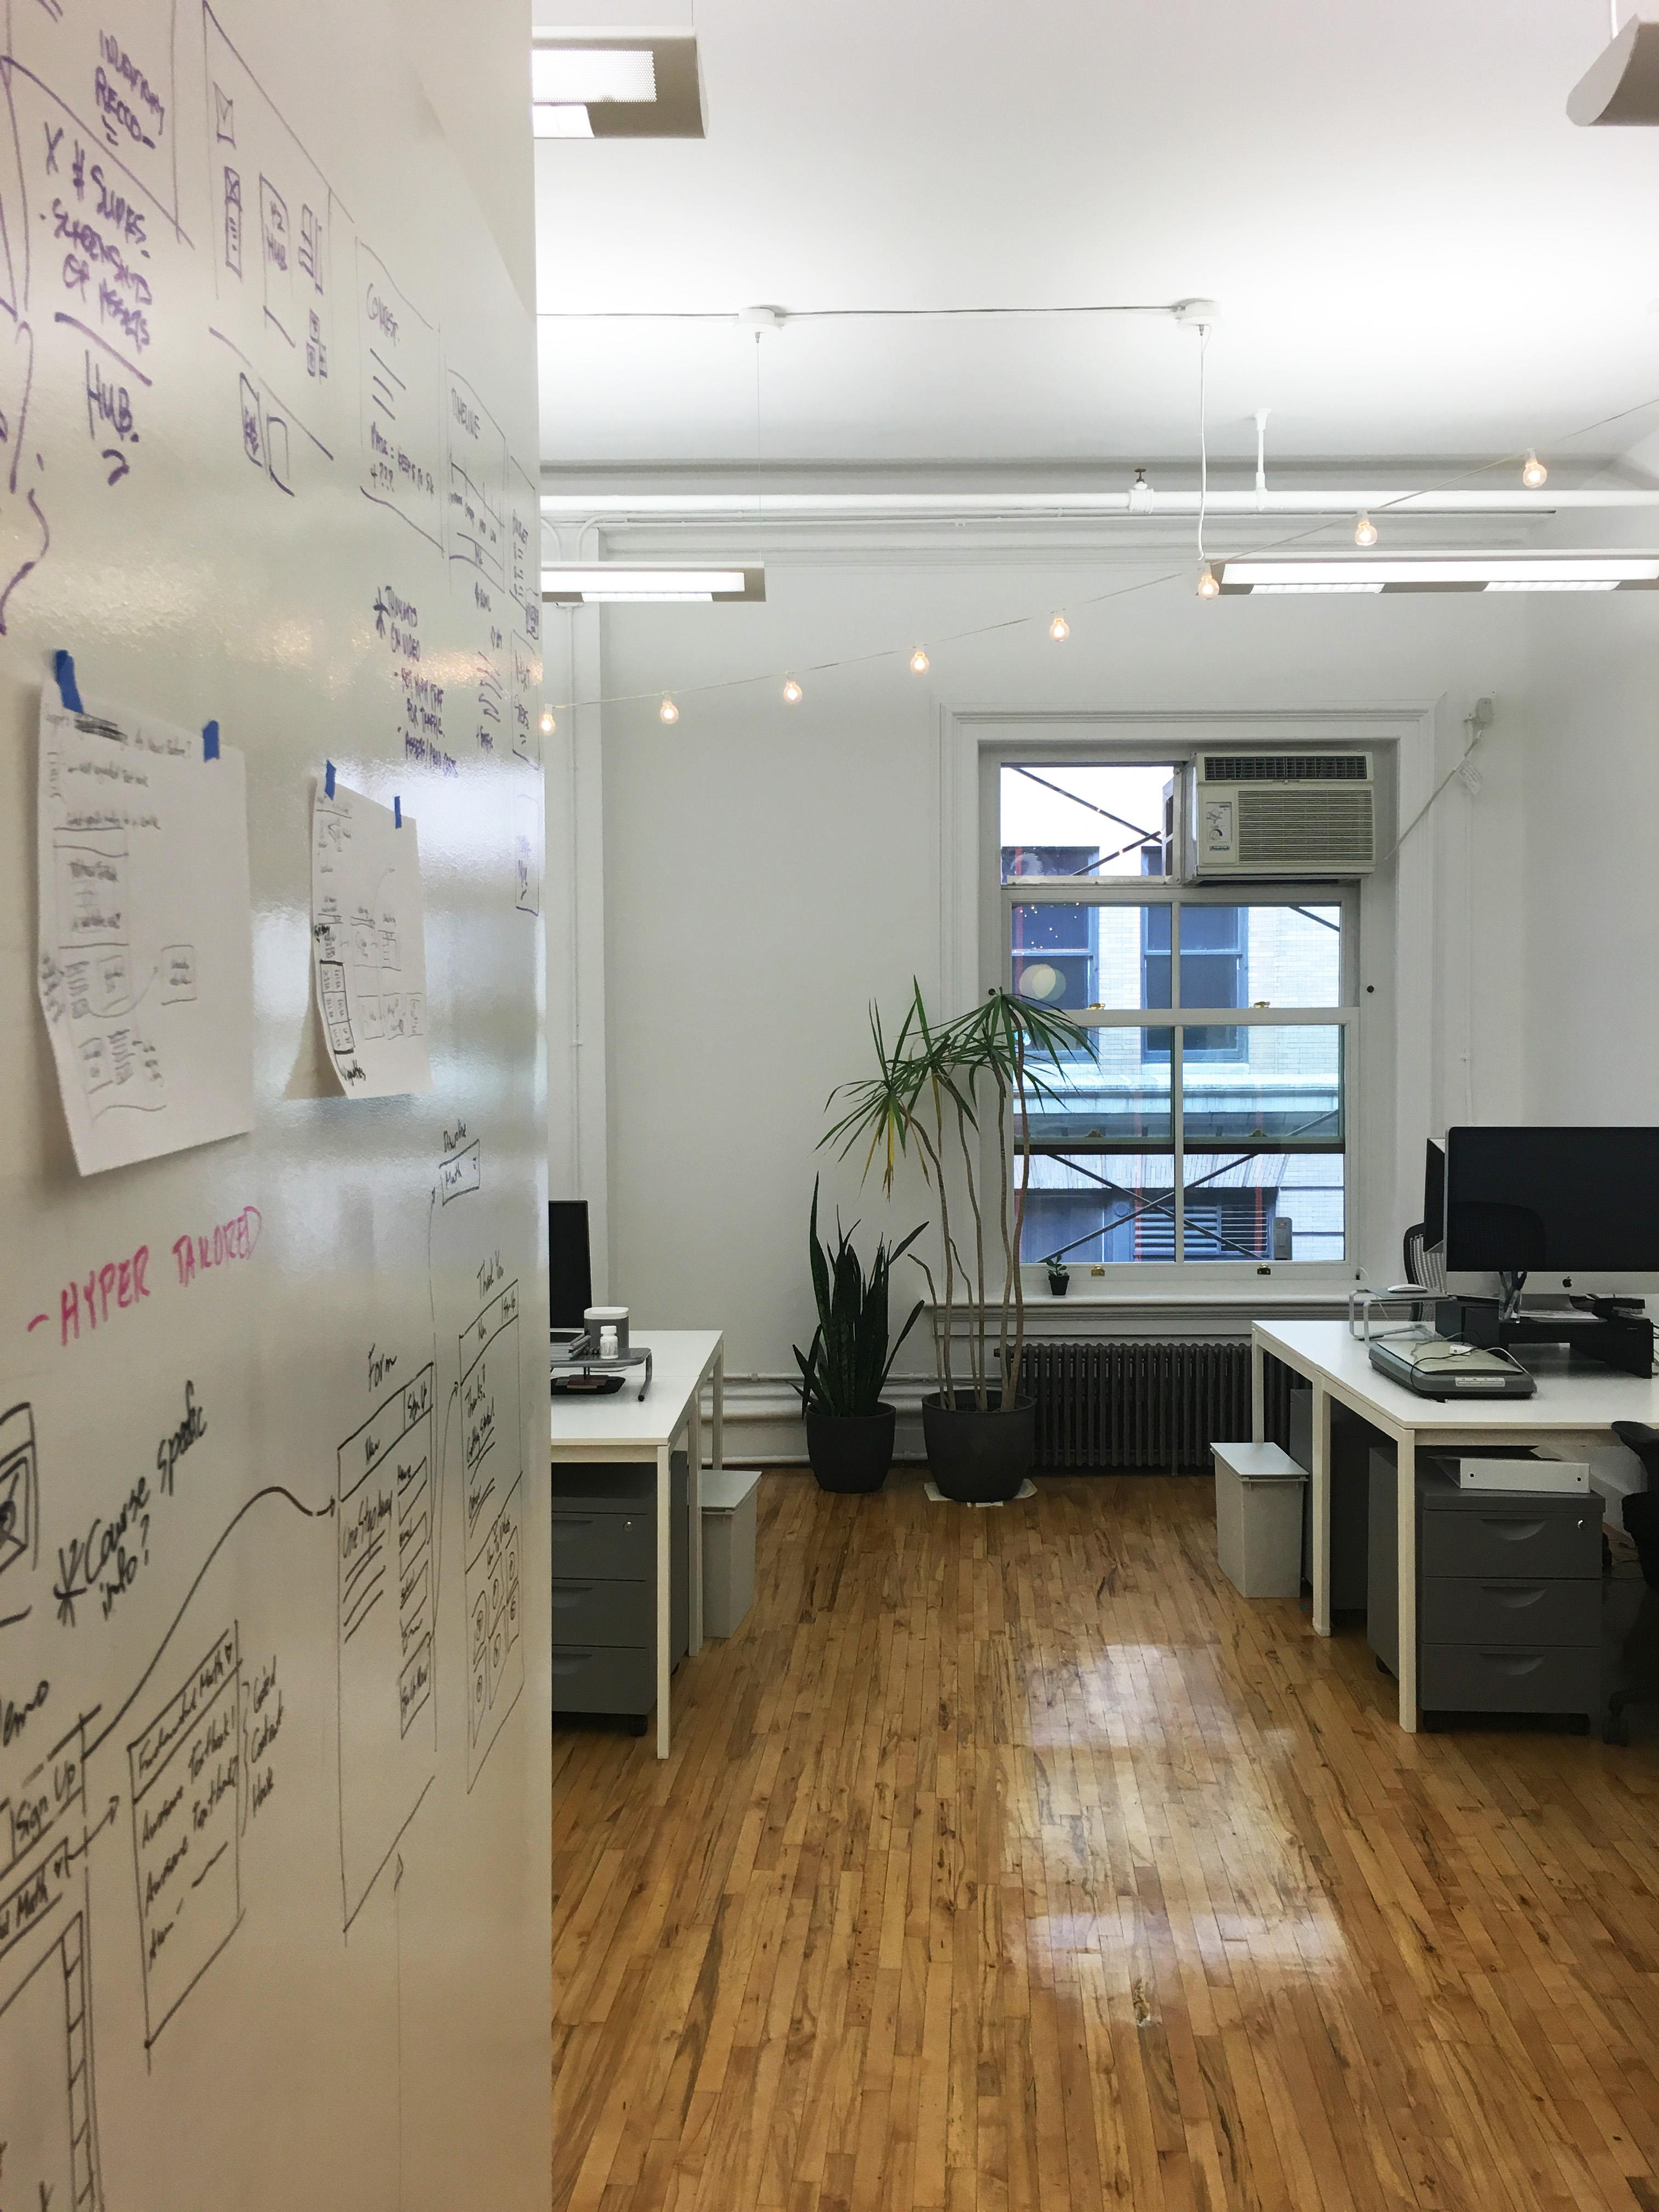 Engine Digital - SoHo studio with room to 6